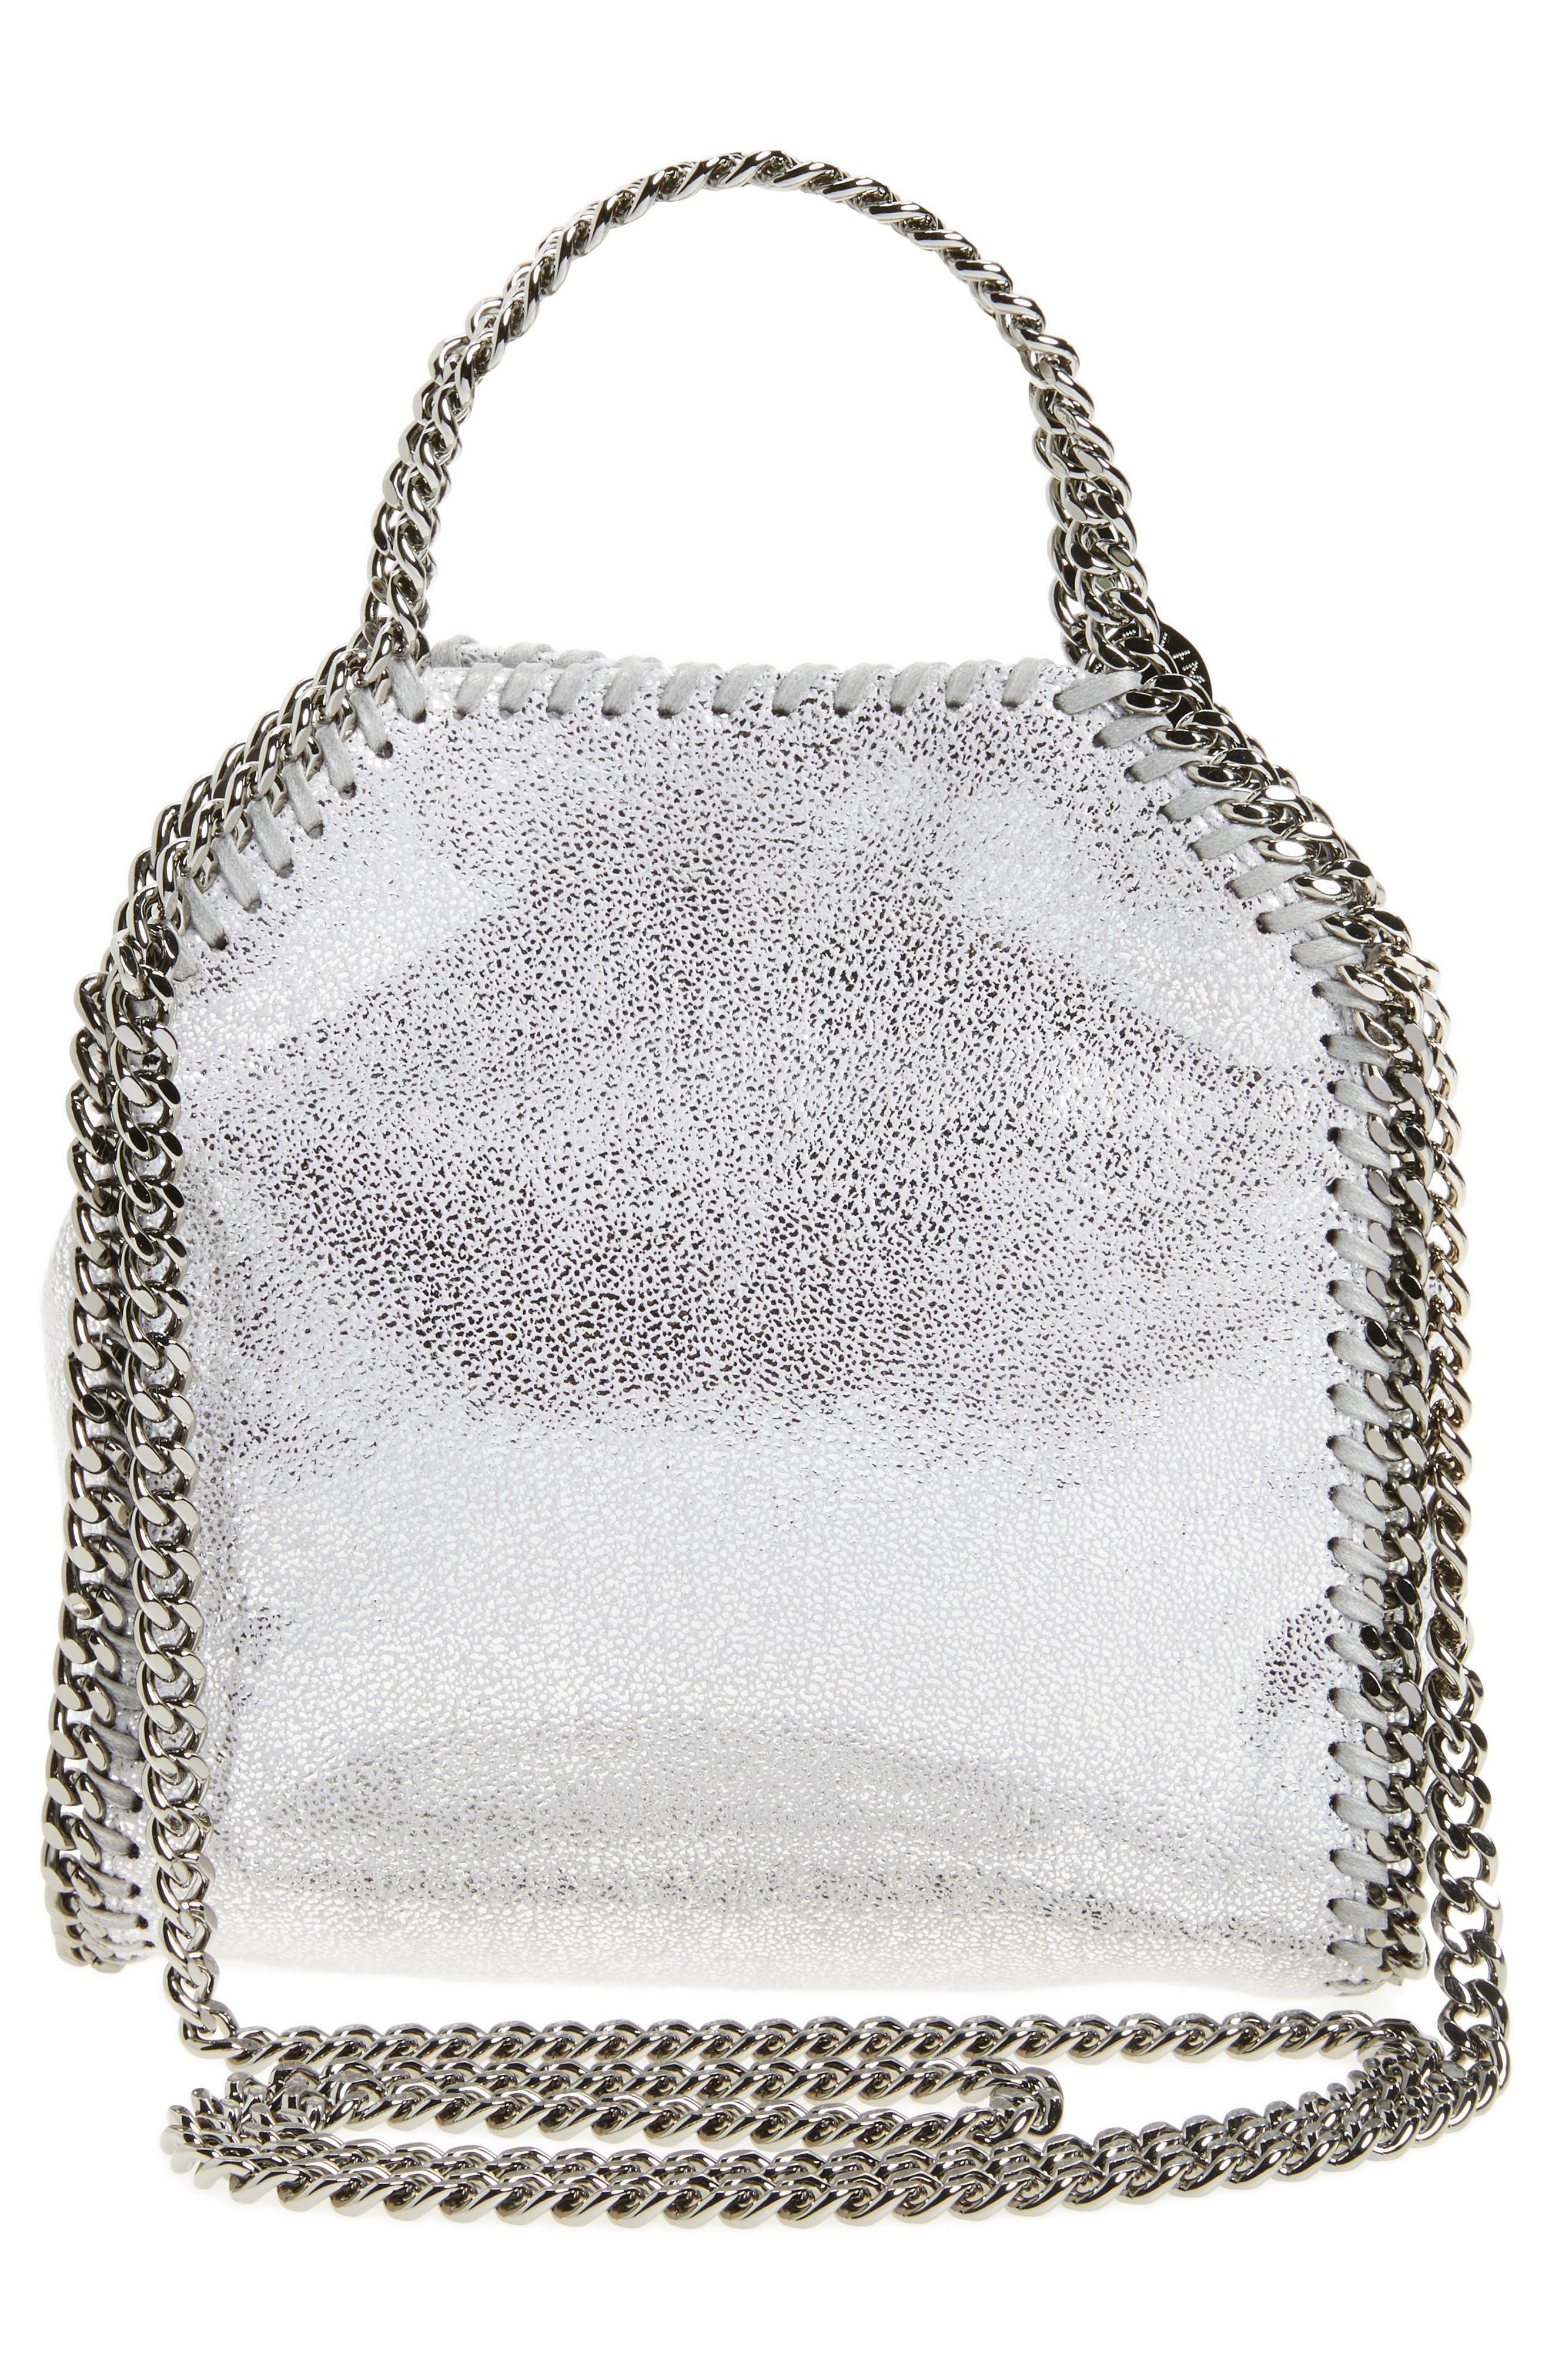 'Tiny Falabella' Metallic Faux Leather Crossbody Bag,                             Alternate thumbnail 3, color,                             045